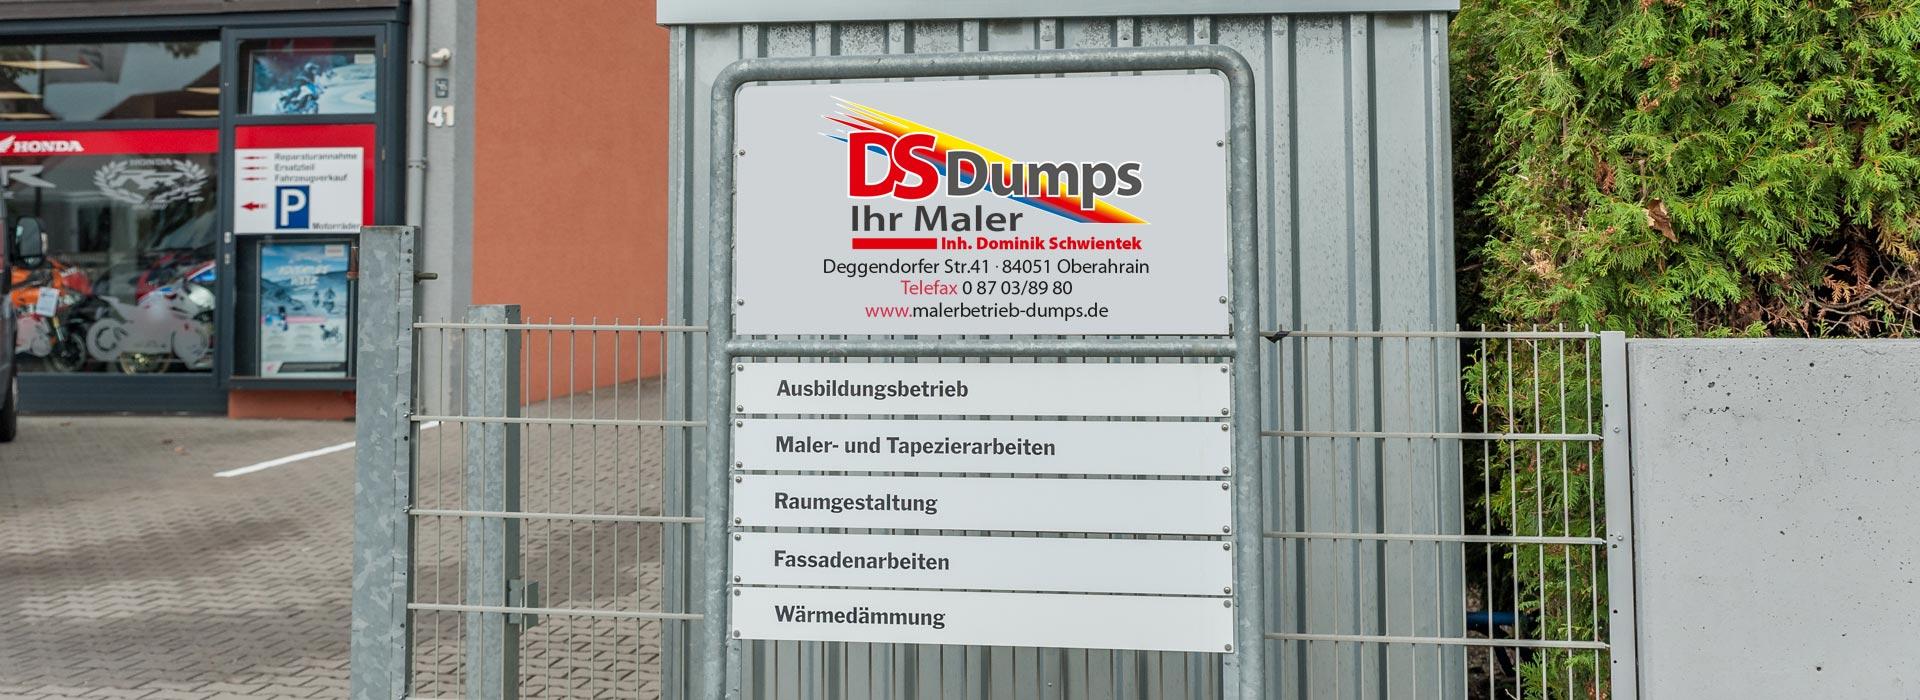 Maler Dumps in Oberahrain